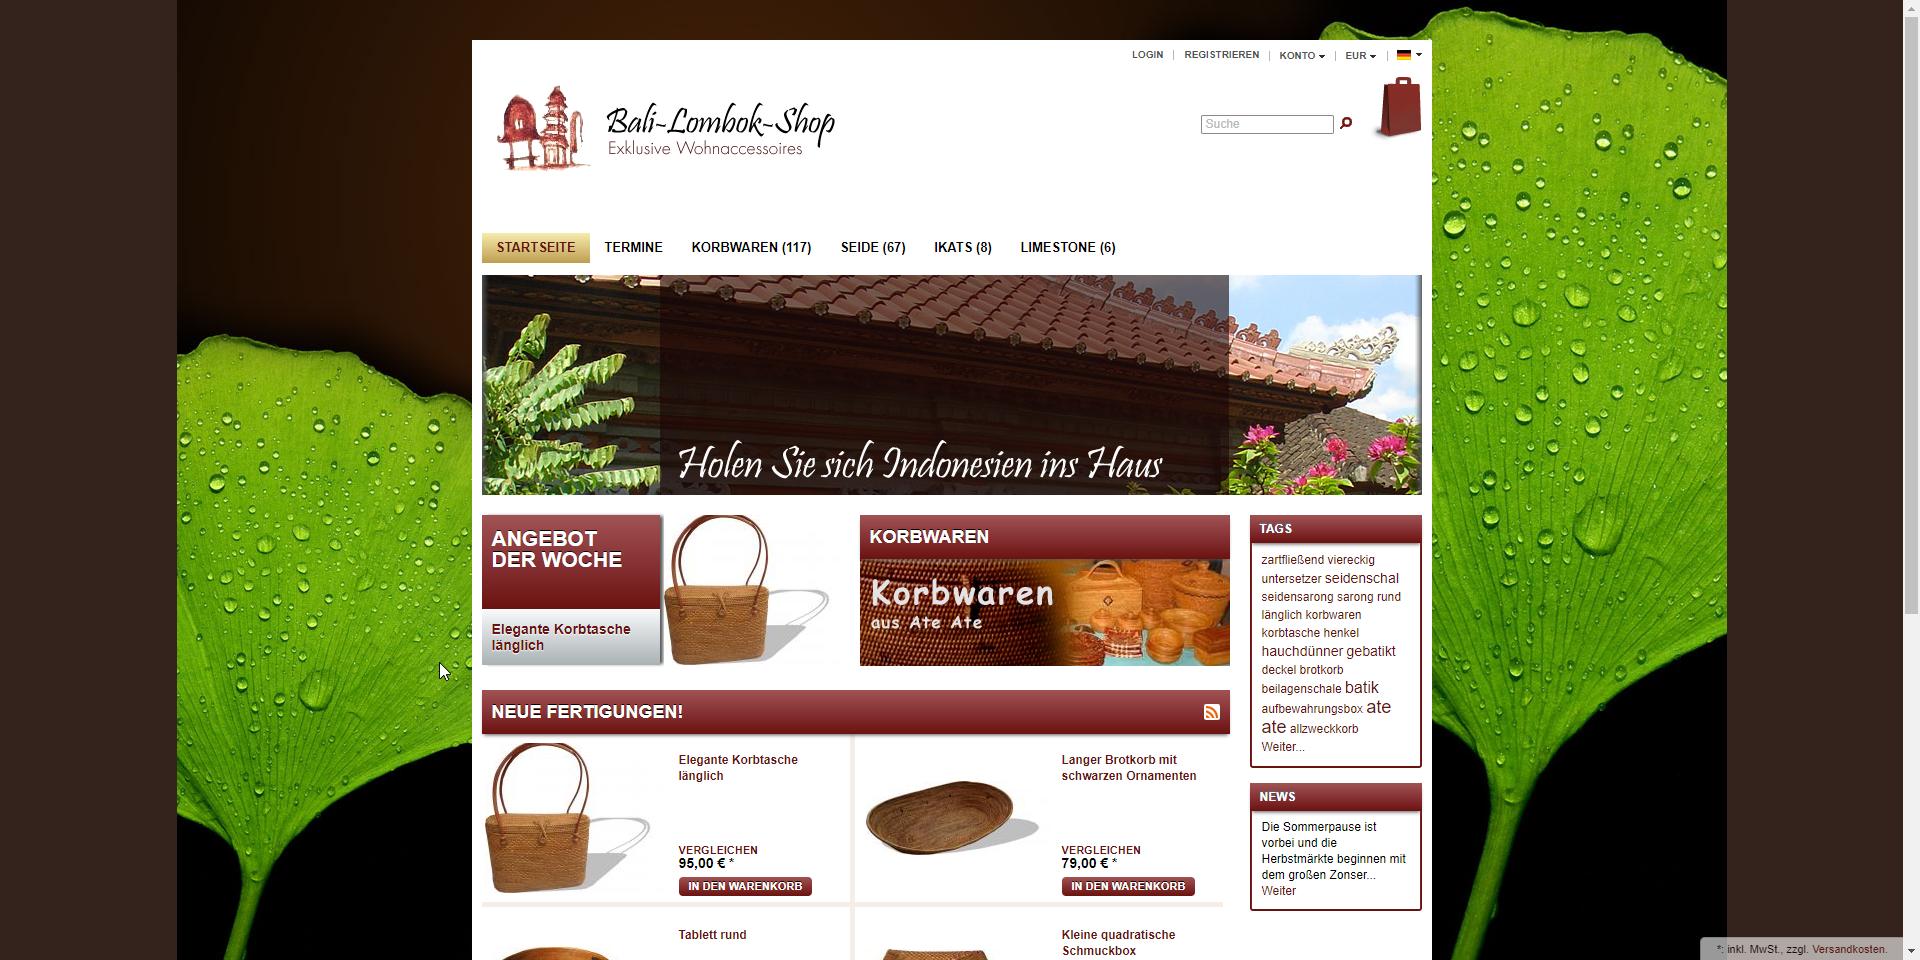 Bali Lombok Shop